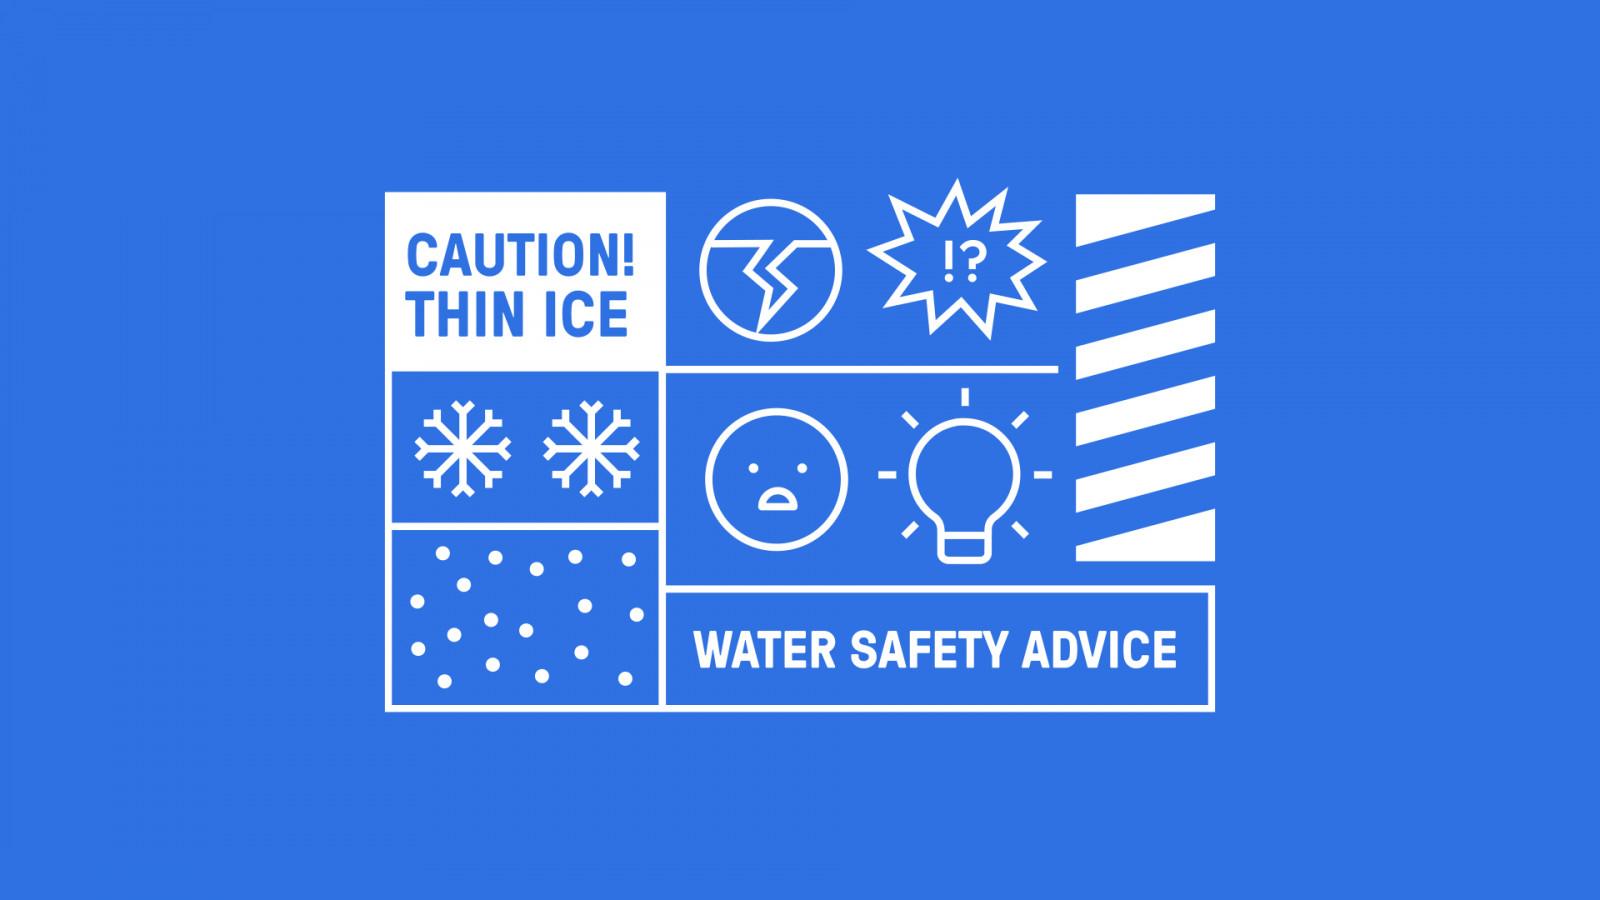 Royal Life Saving Society –iconography -  image for Royal Life Saving Society project